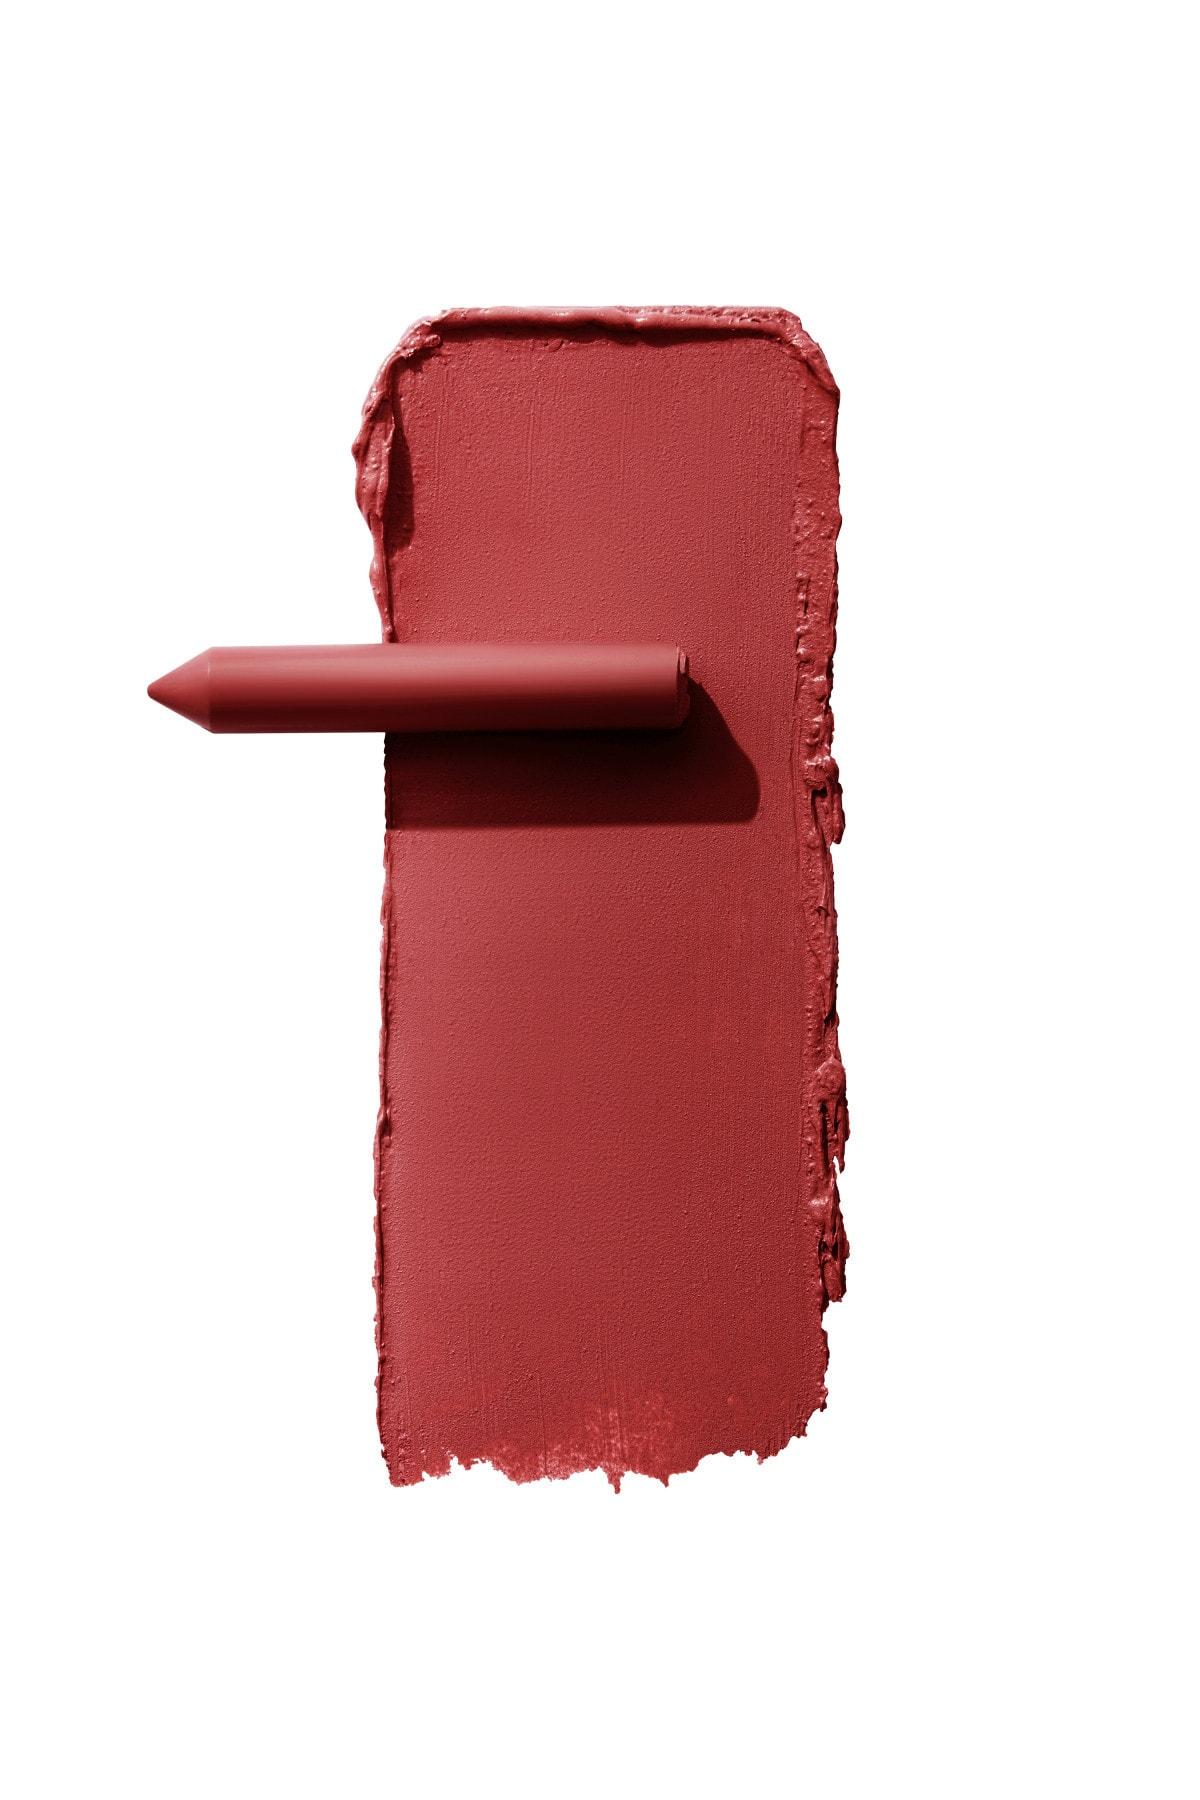 Maybelline New York Kalem Ruj - Sw Superstay Ink Crayon 45 Hustle in Heels 30174108 2